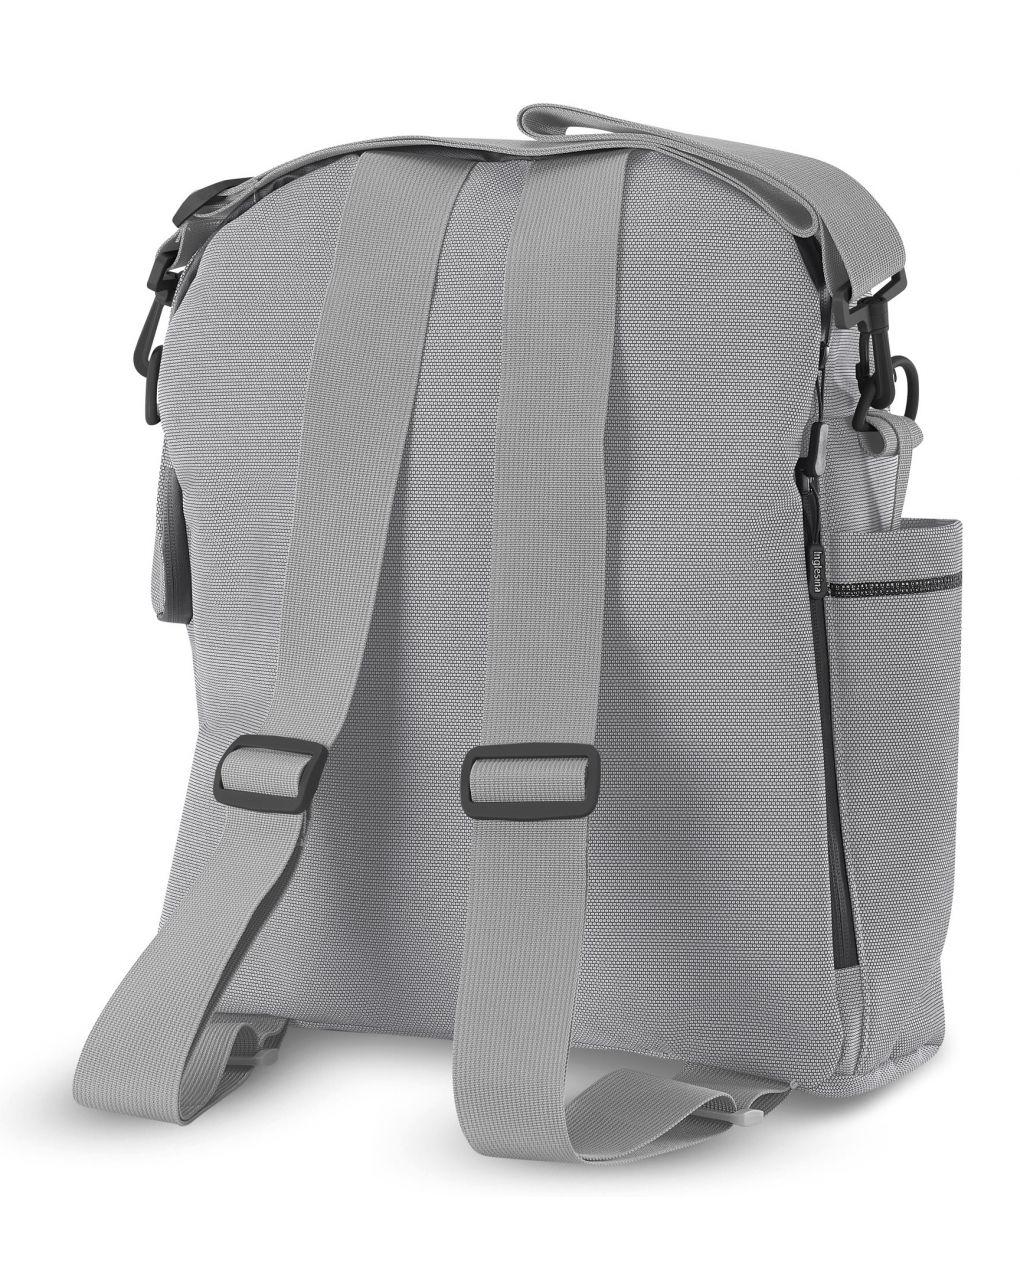 Borsa aptica xt adventure bag - colore horizon grey - Inglesina